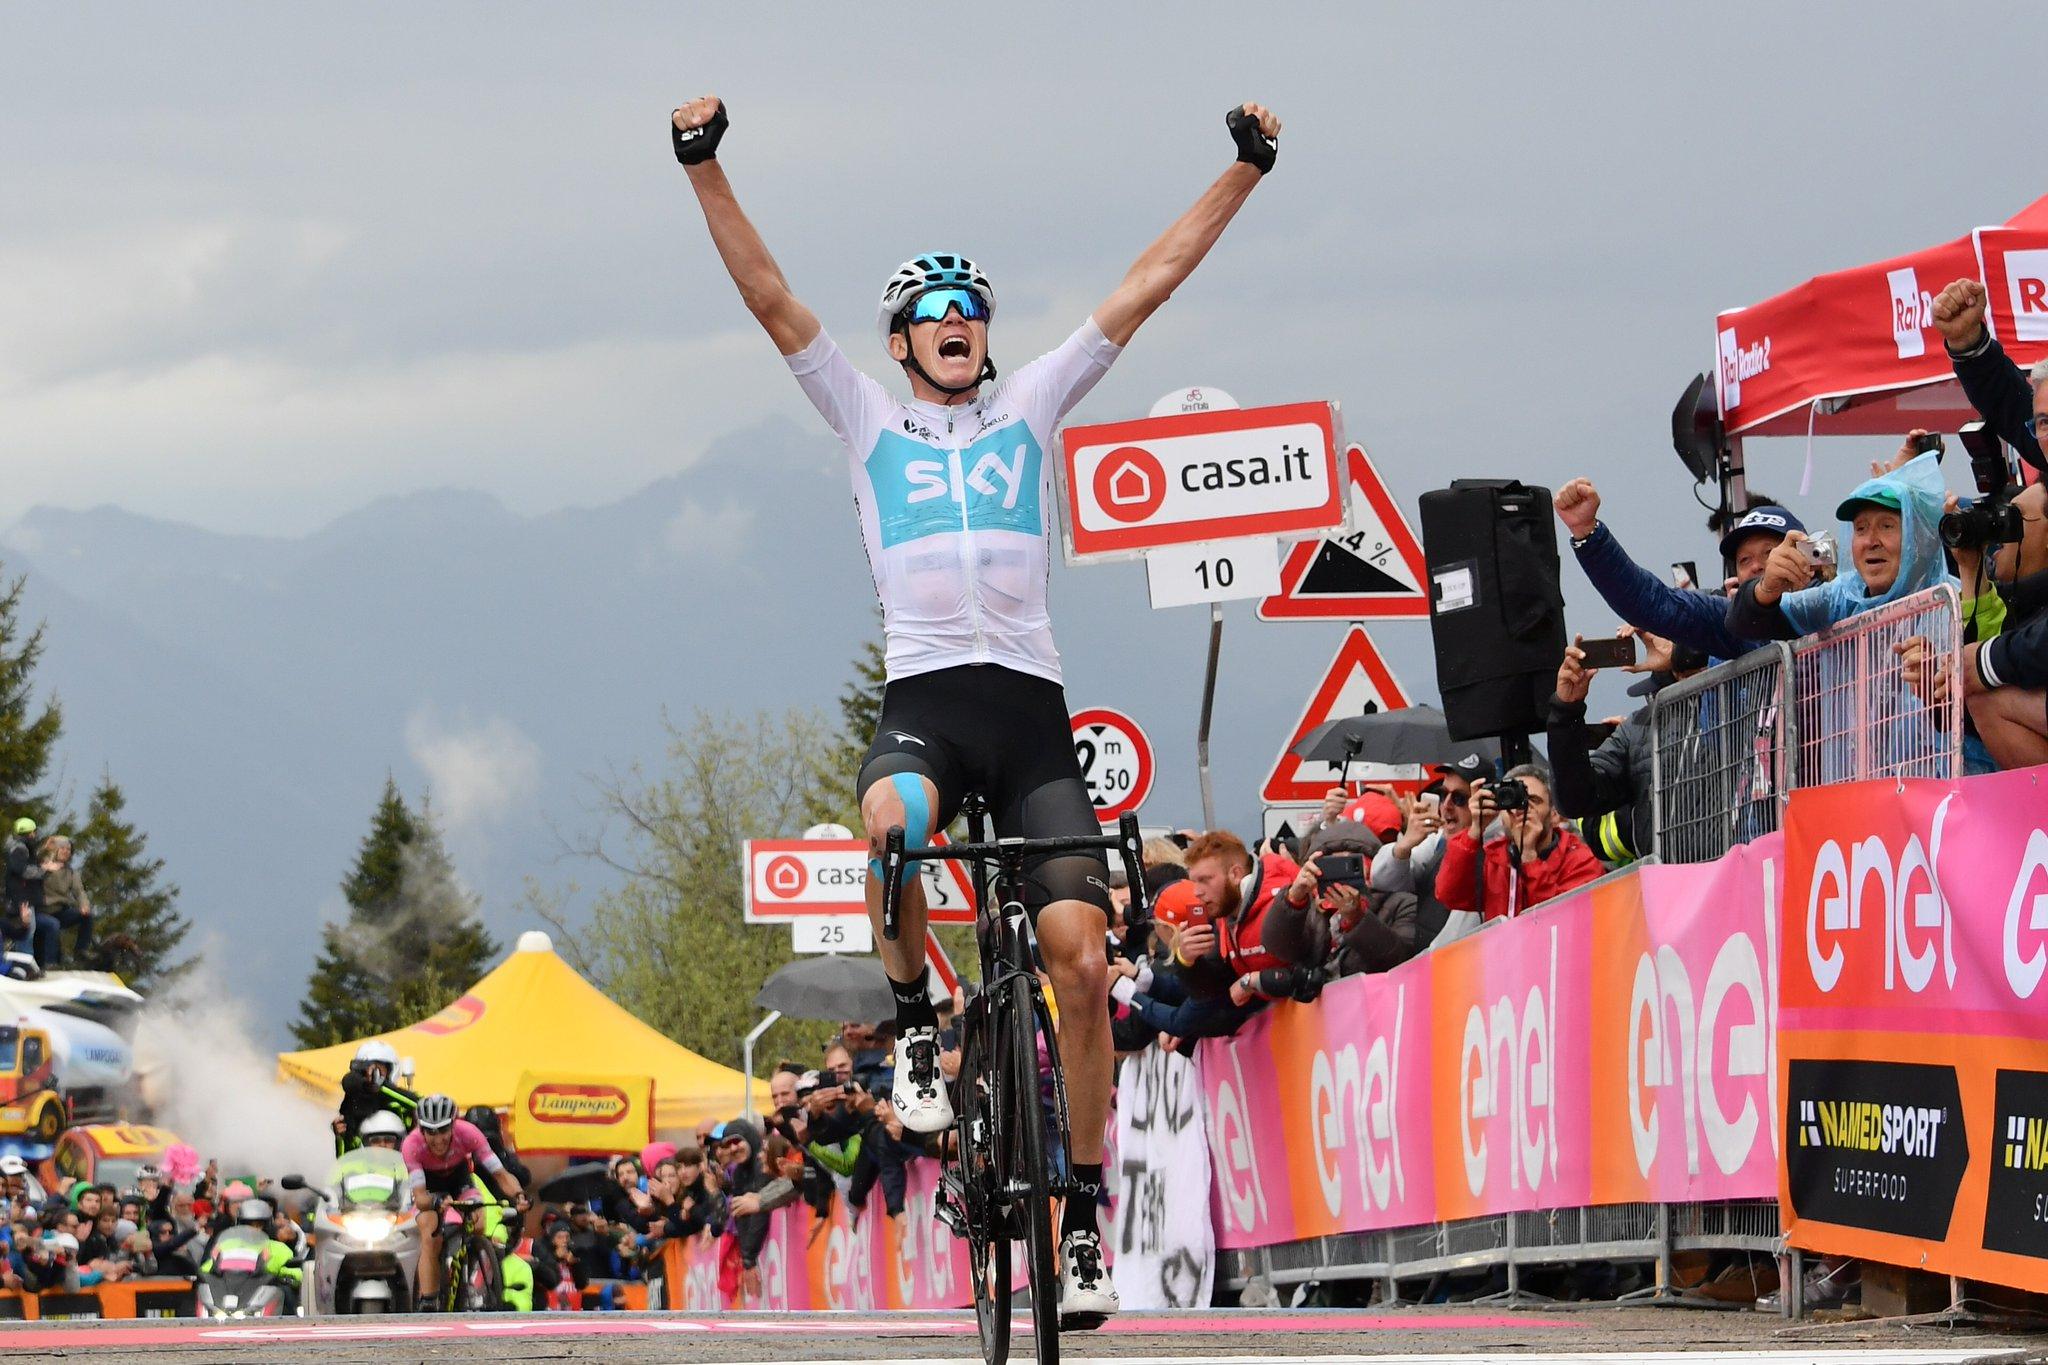 6ee86e1ec Giro d'Italia 2018: Froome pierwszy na Zoncolan, Yates liderem ...